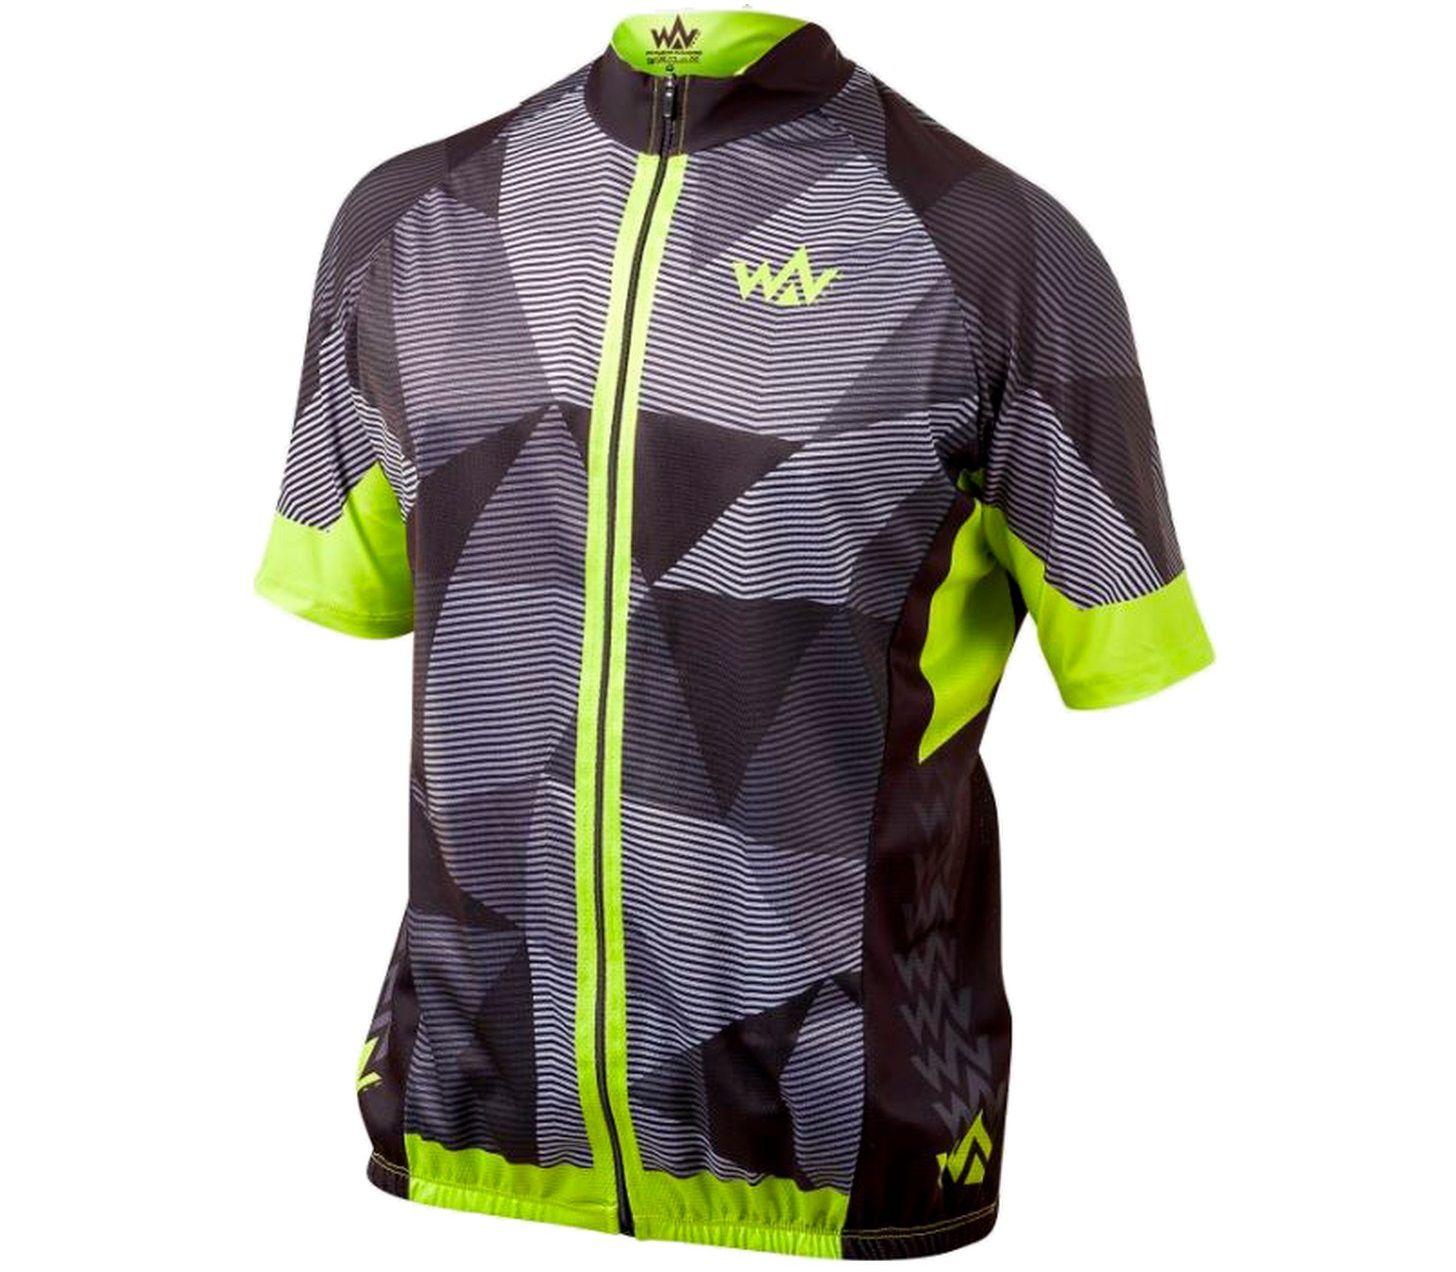 c630aa1c25 Camisa Ciclismo MTB-001 Prismas Preto Amarelo WV Team